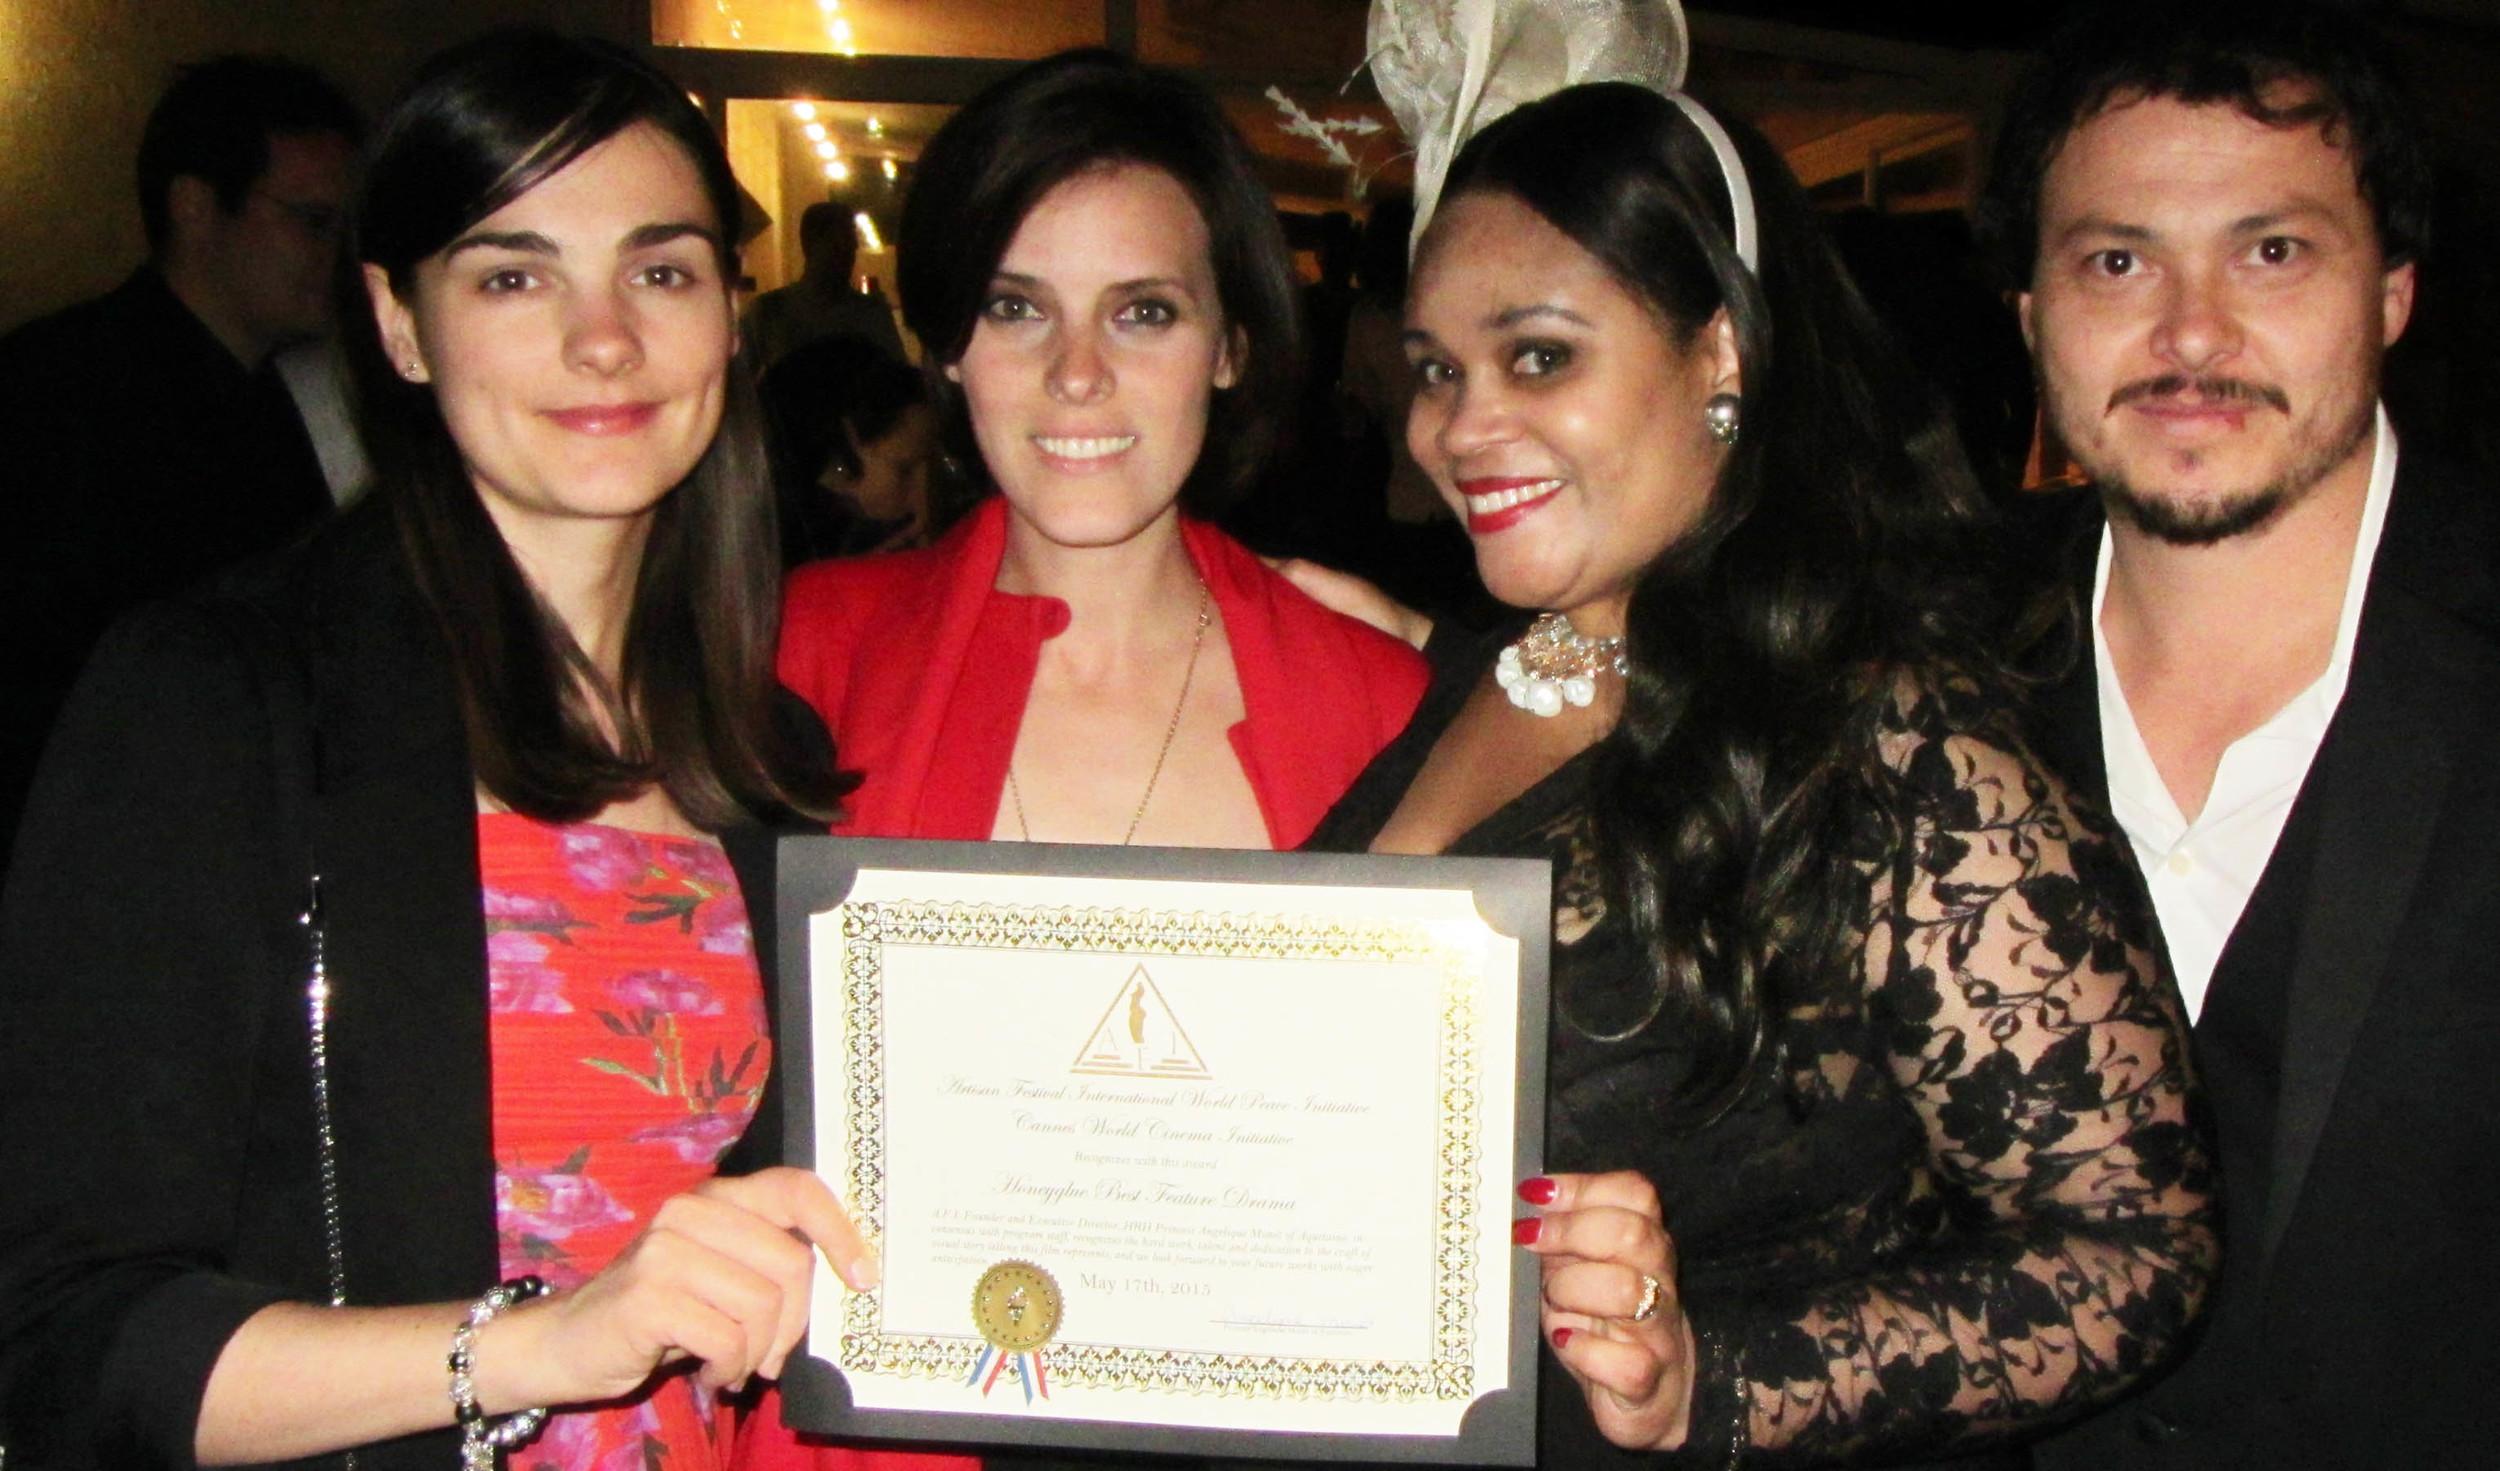 Honeyglue wins Best Feature Drama